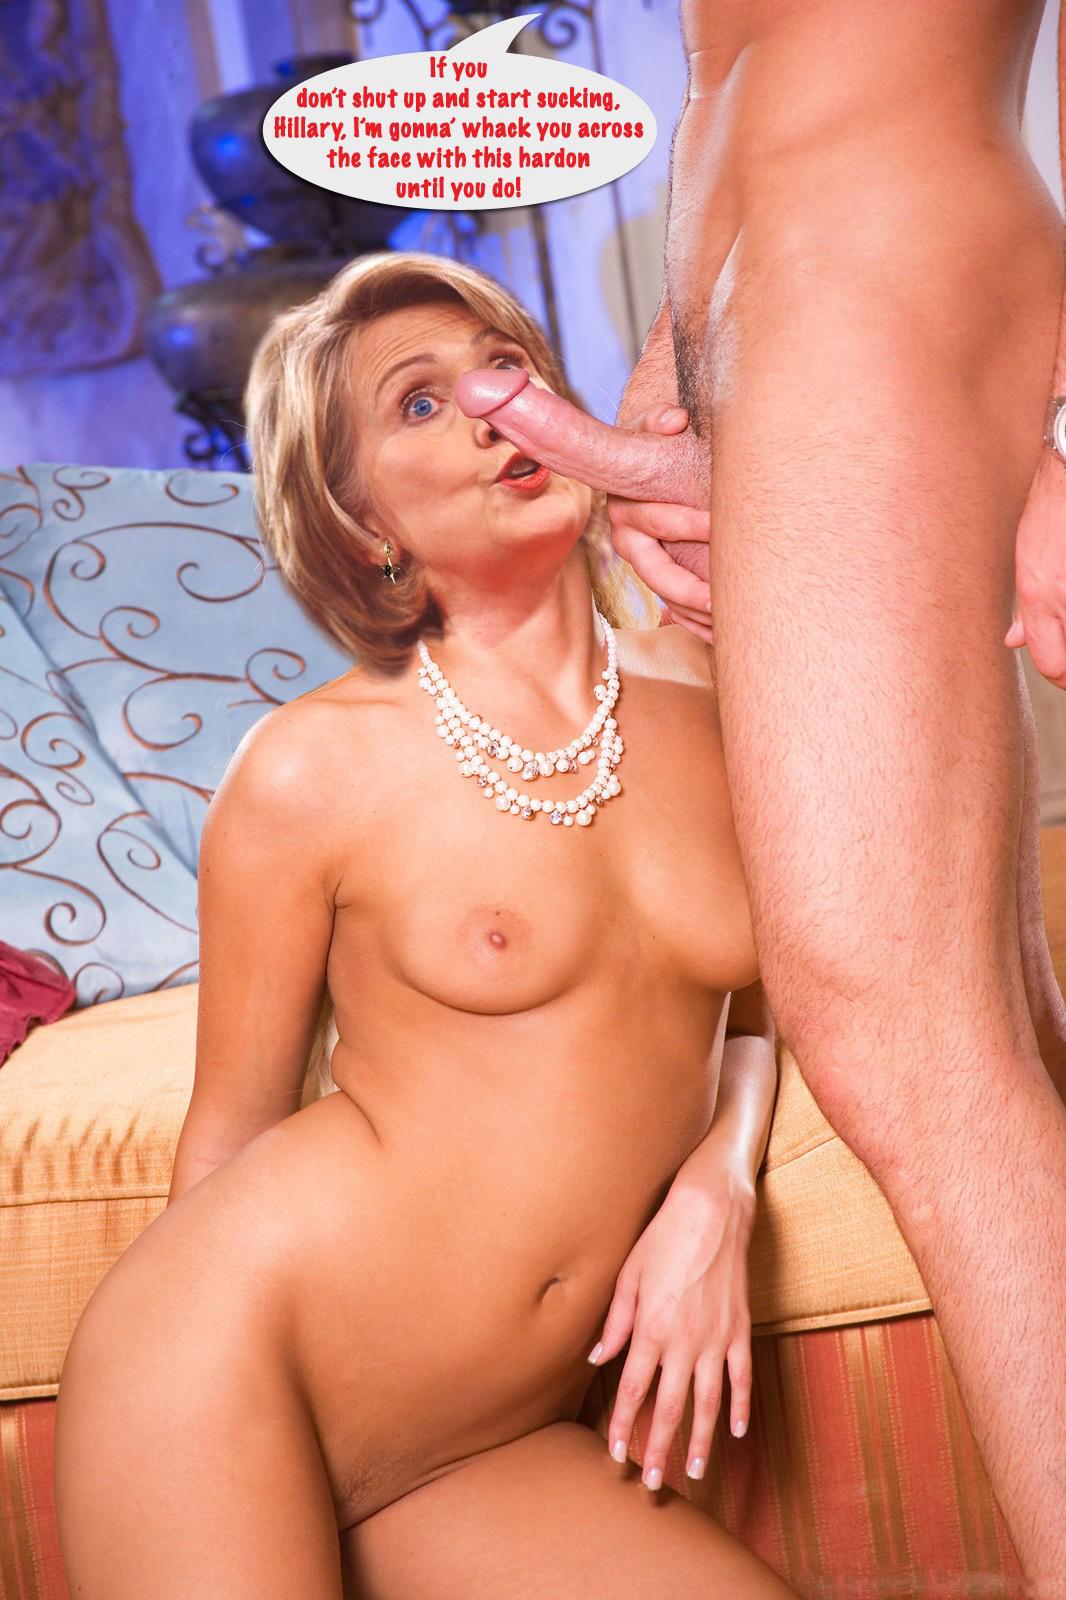 Hillary clinton monica lewinsky nude